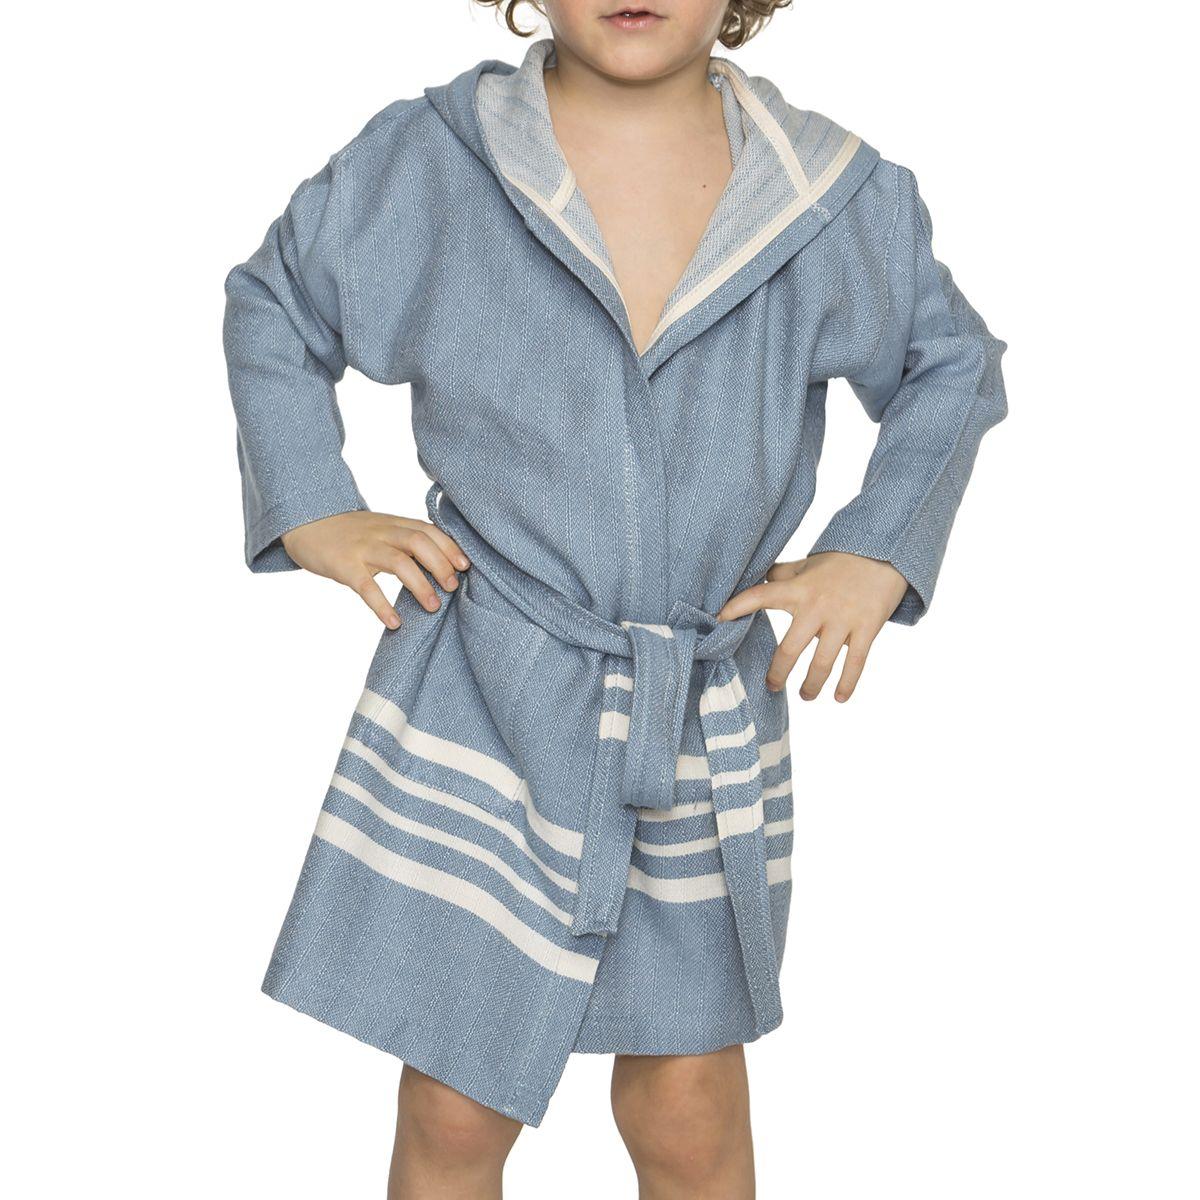 Bathrobe Kiddo with hood  - Air Blue